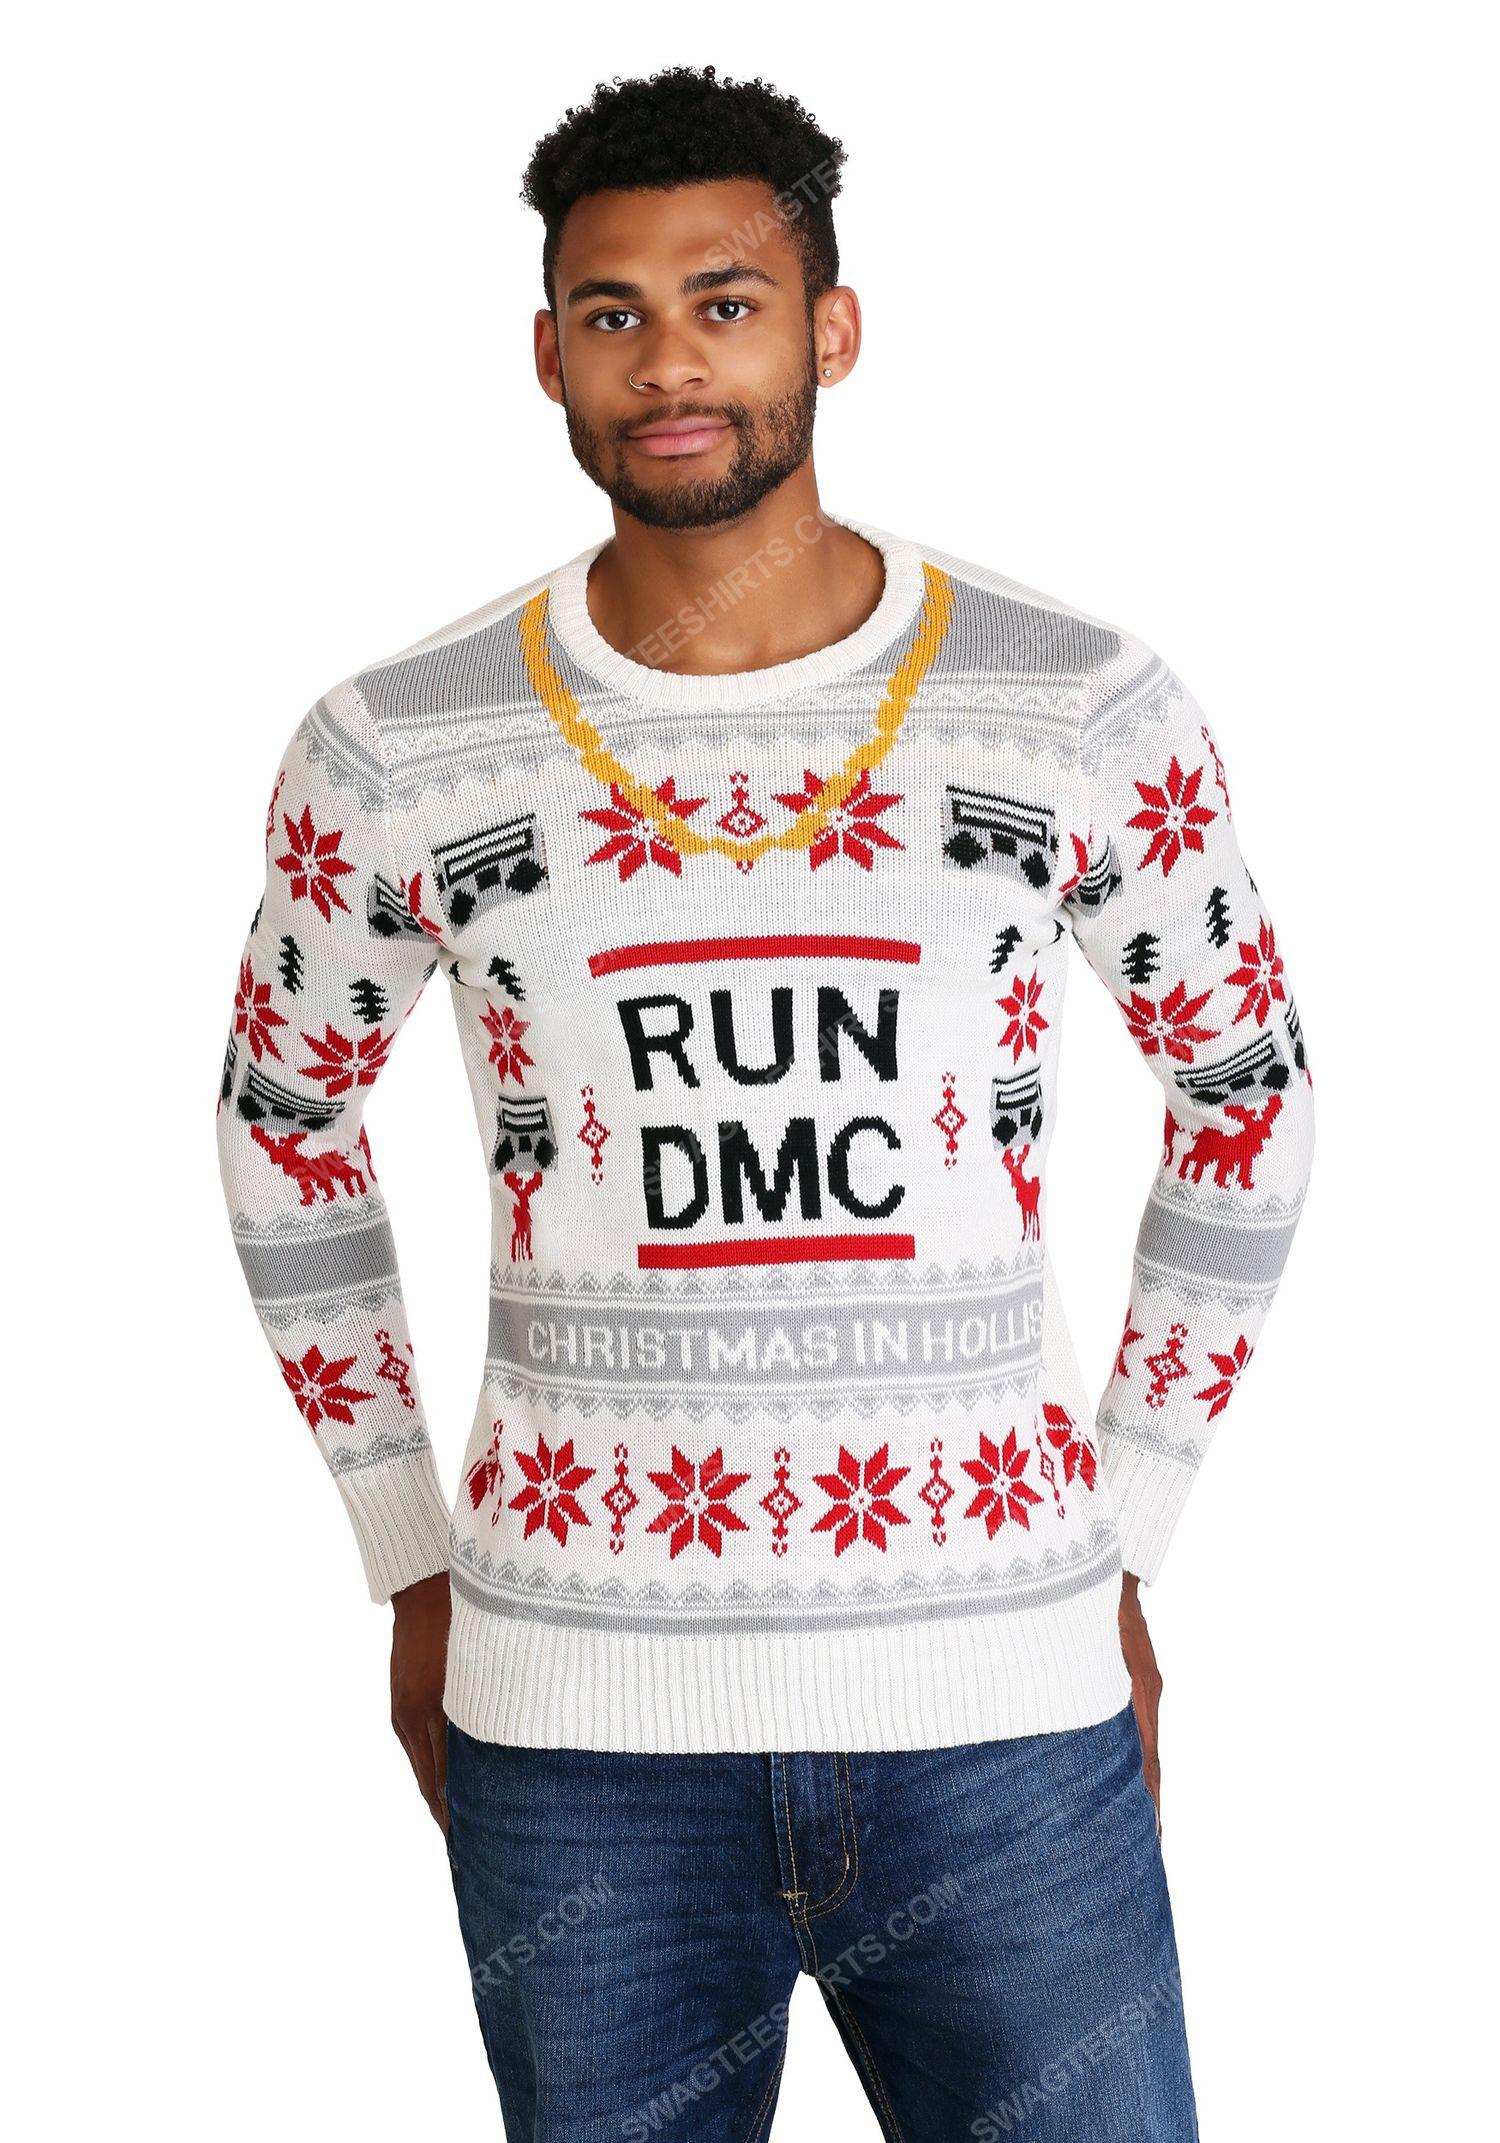 Christmas holiday the run dmc chain full print ugly christmas sweater 2 - Copy (2)